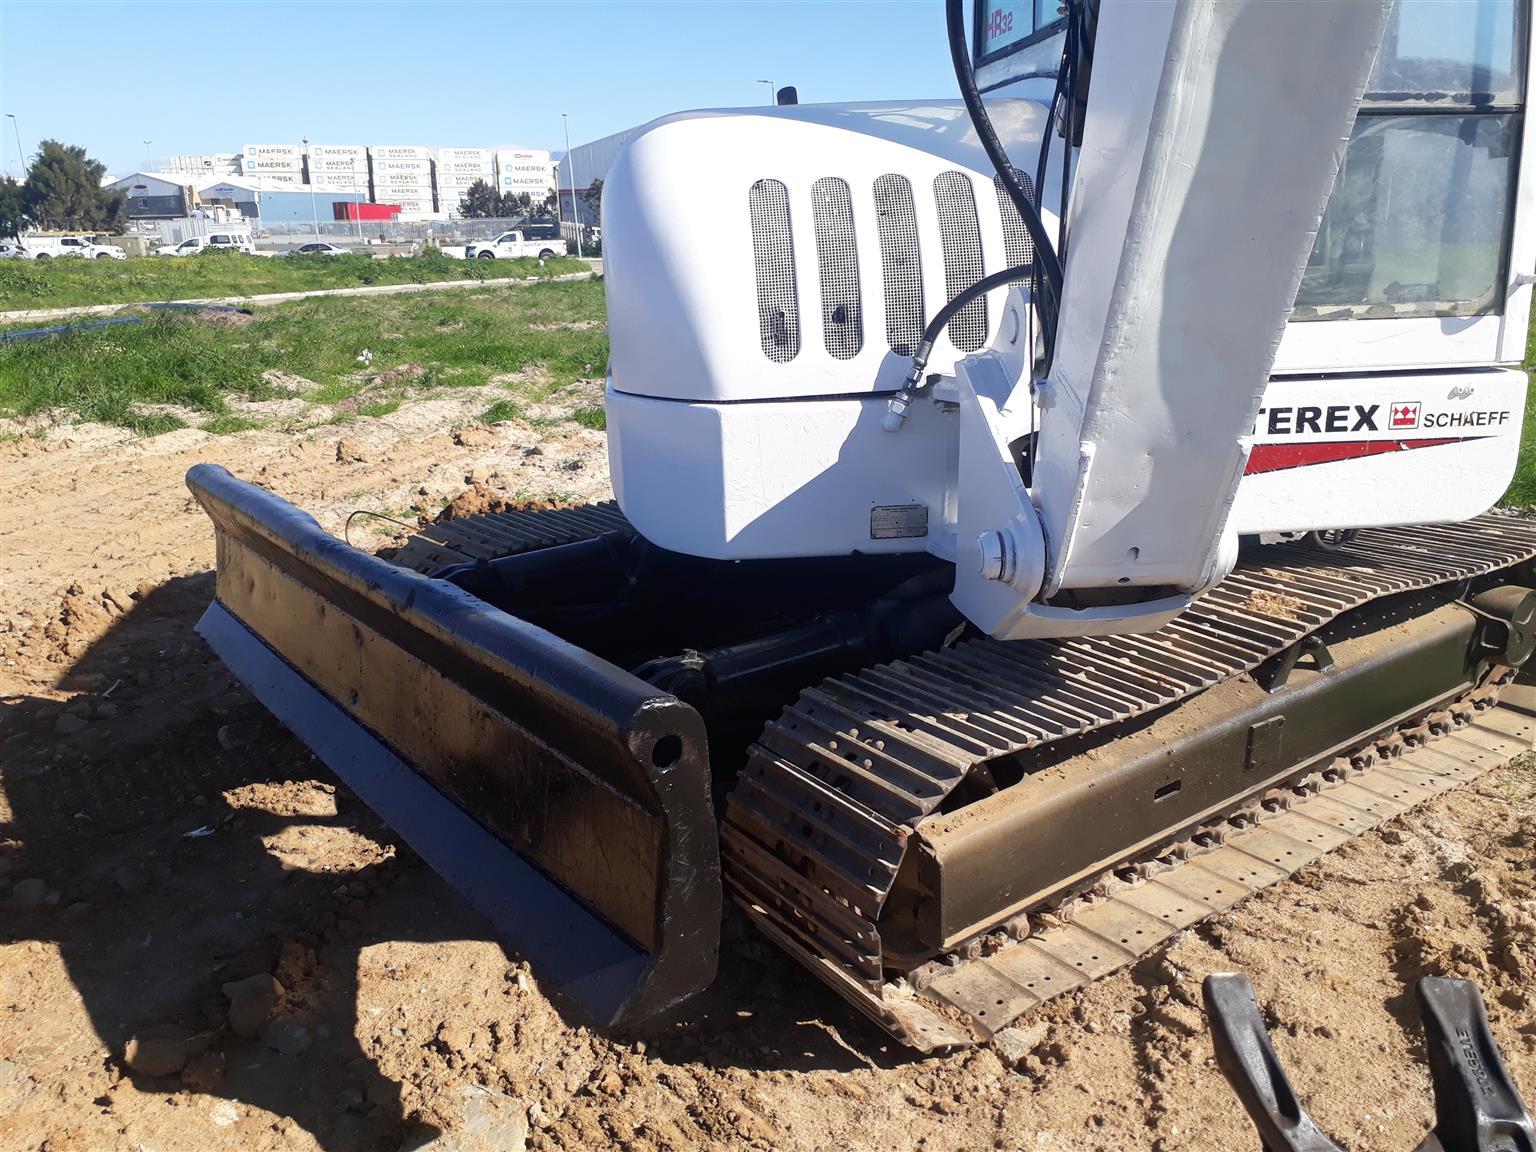 Terex HR32 , 7.5 tonne excavator